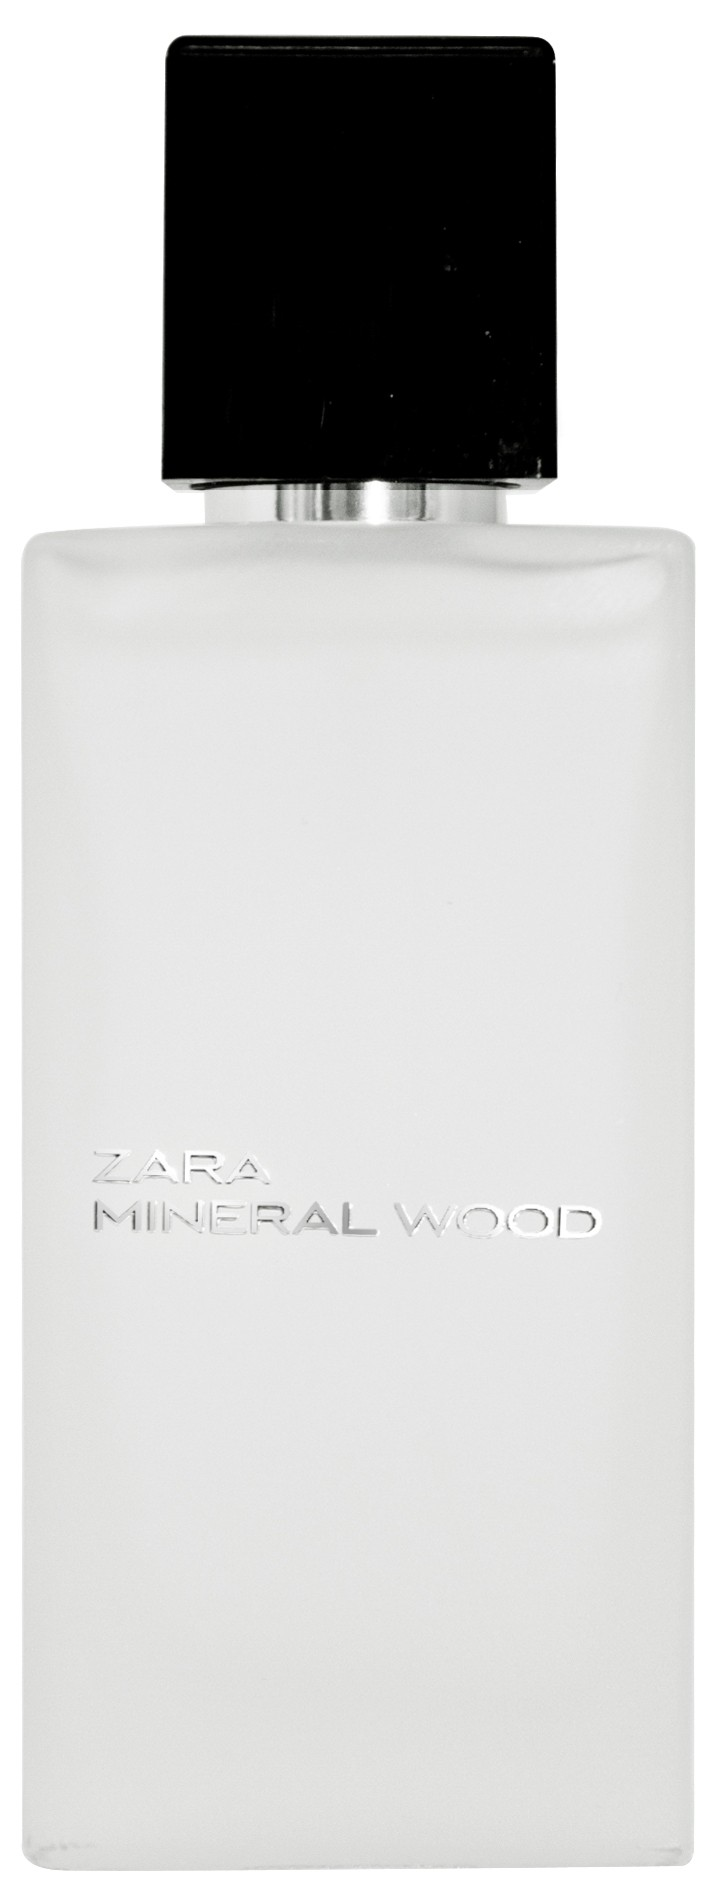 Zara Mineral Wood аромат для мужчин